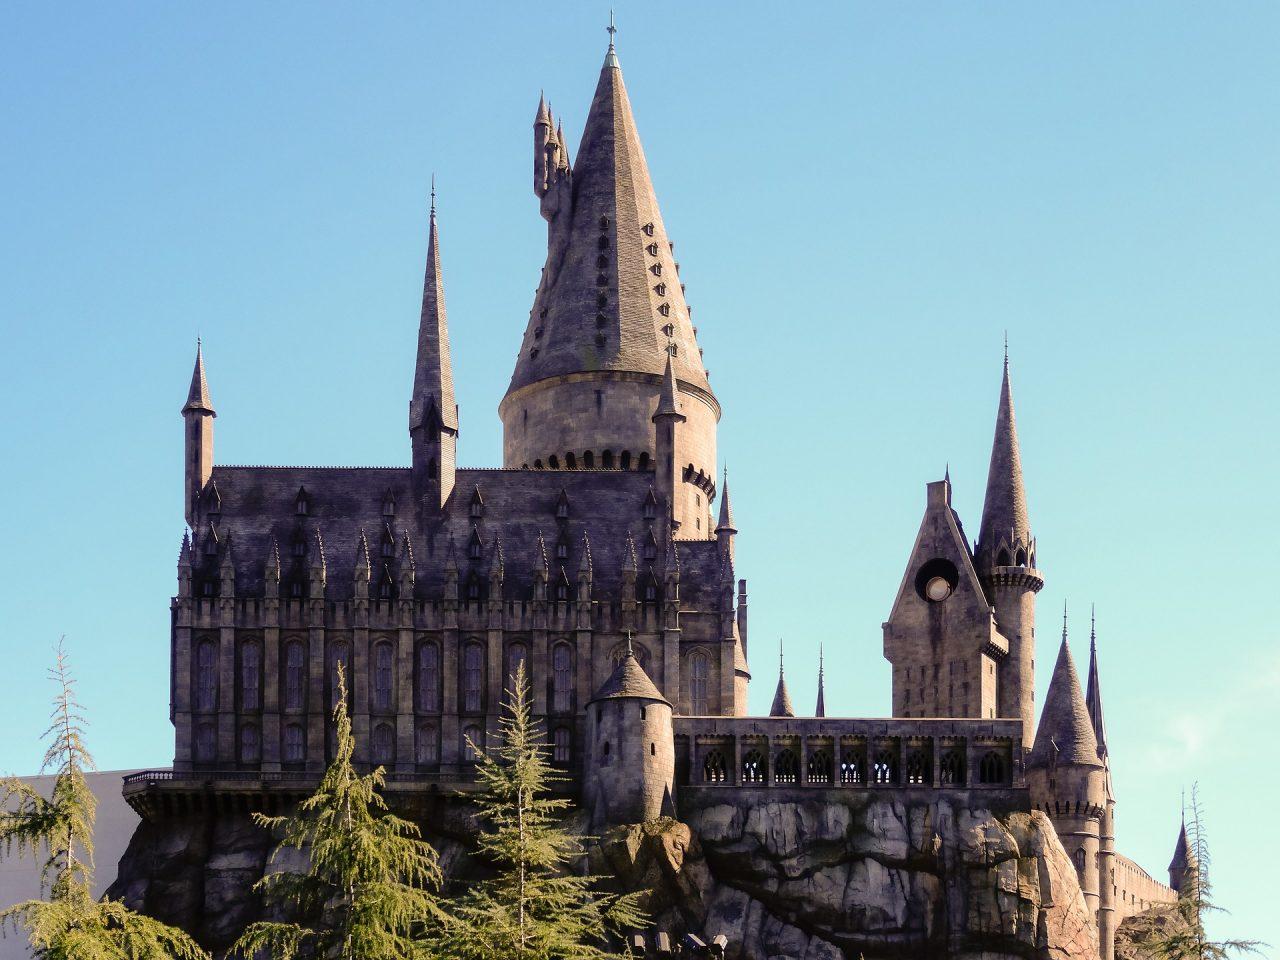 Karte Des Rumtreibers Pdf.7 Zauberhafte Diy S Rund Um Das Harry Potter Universum Diy Family